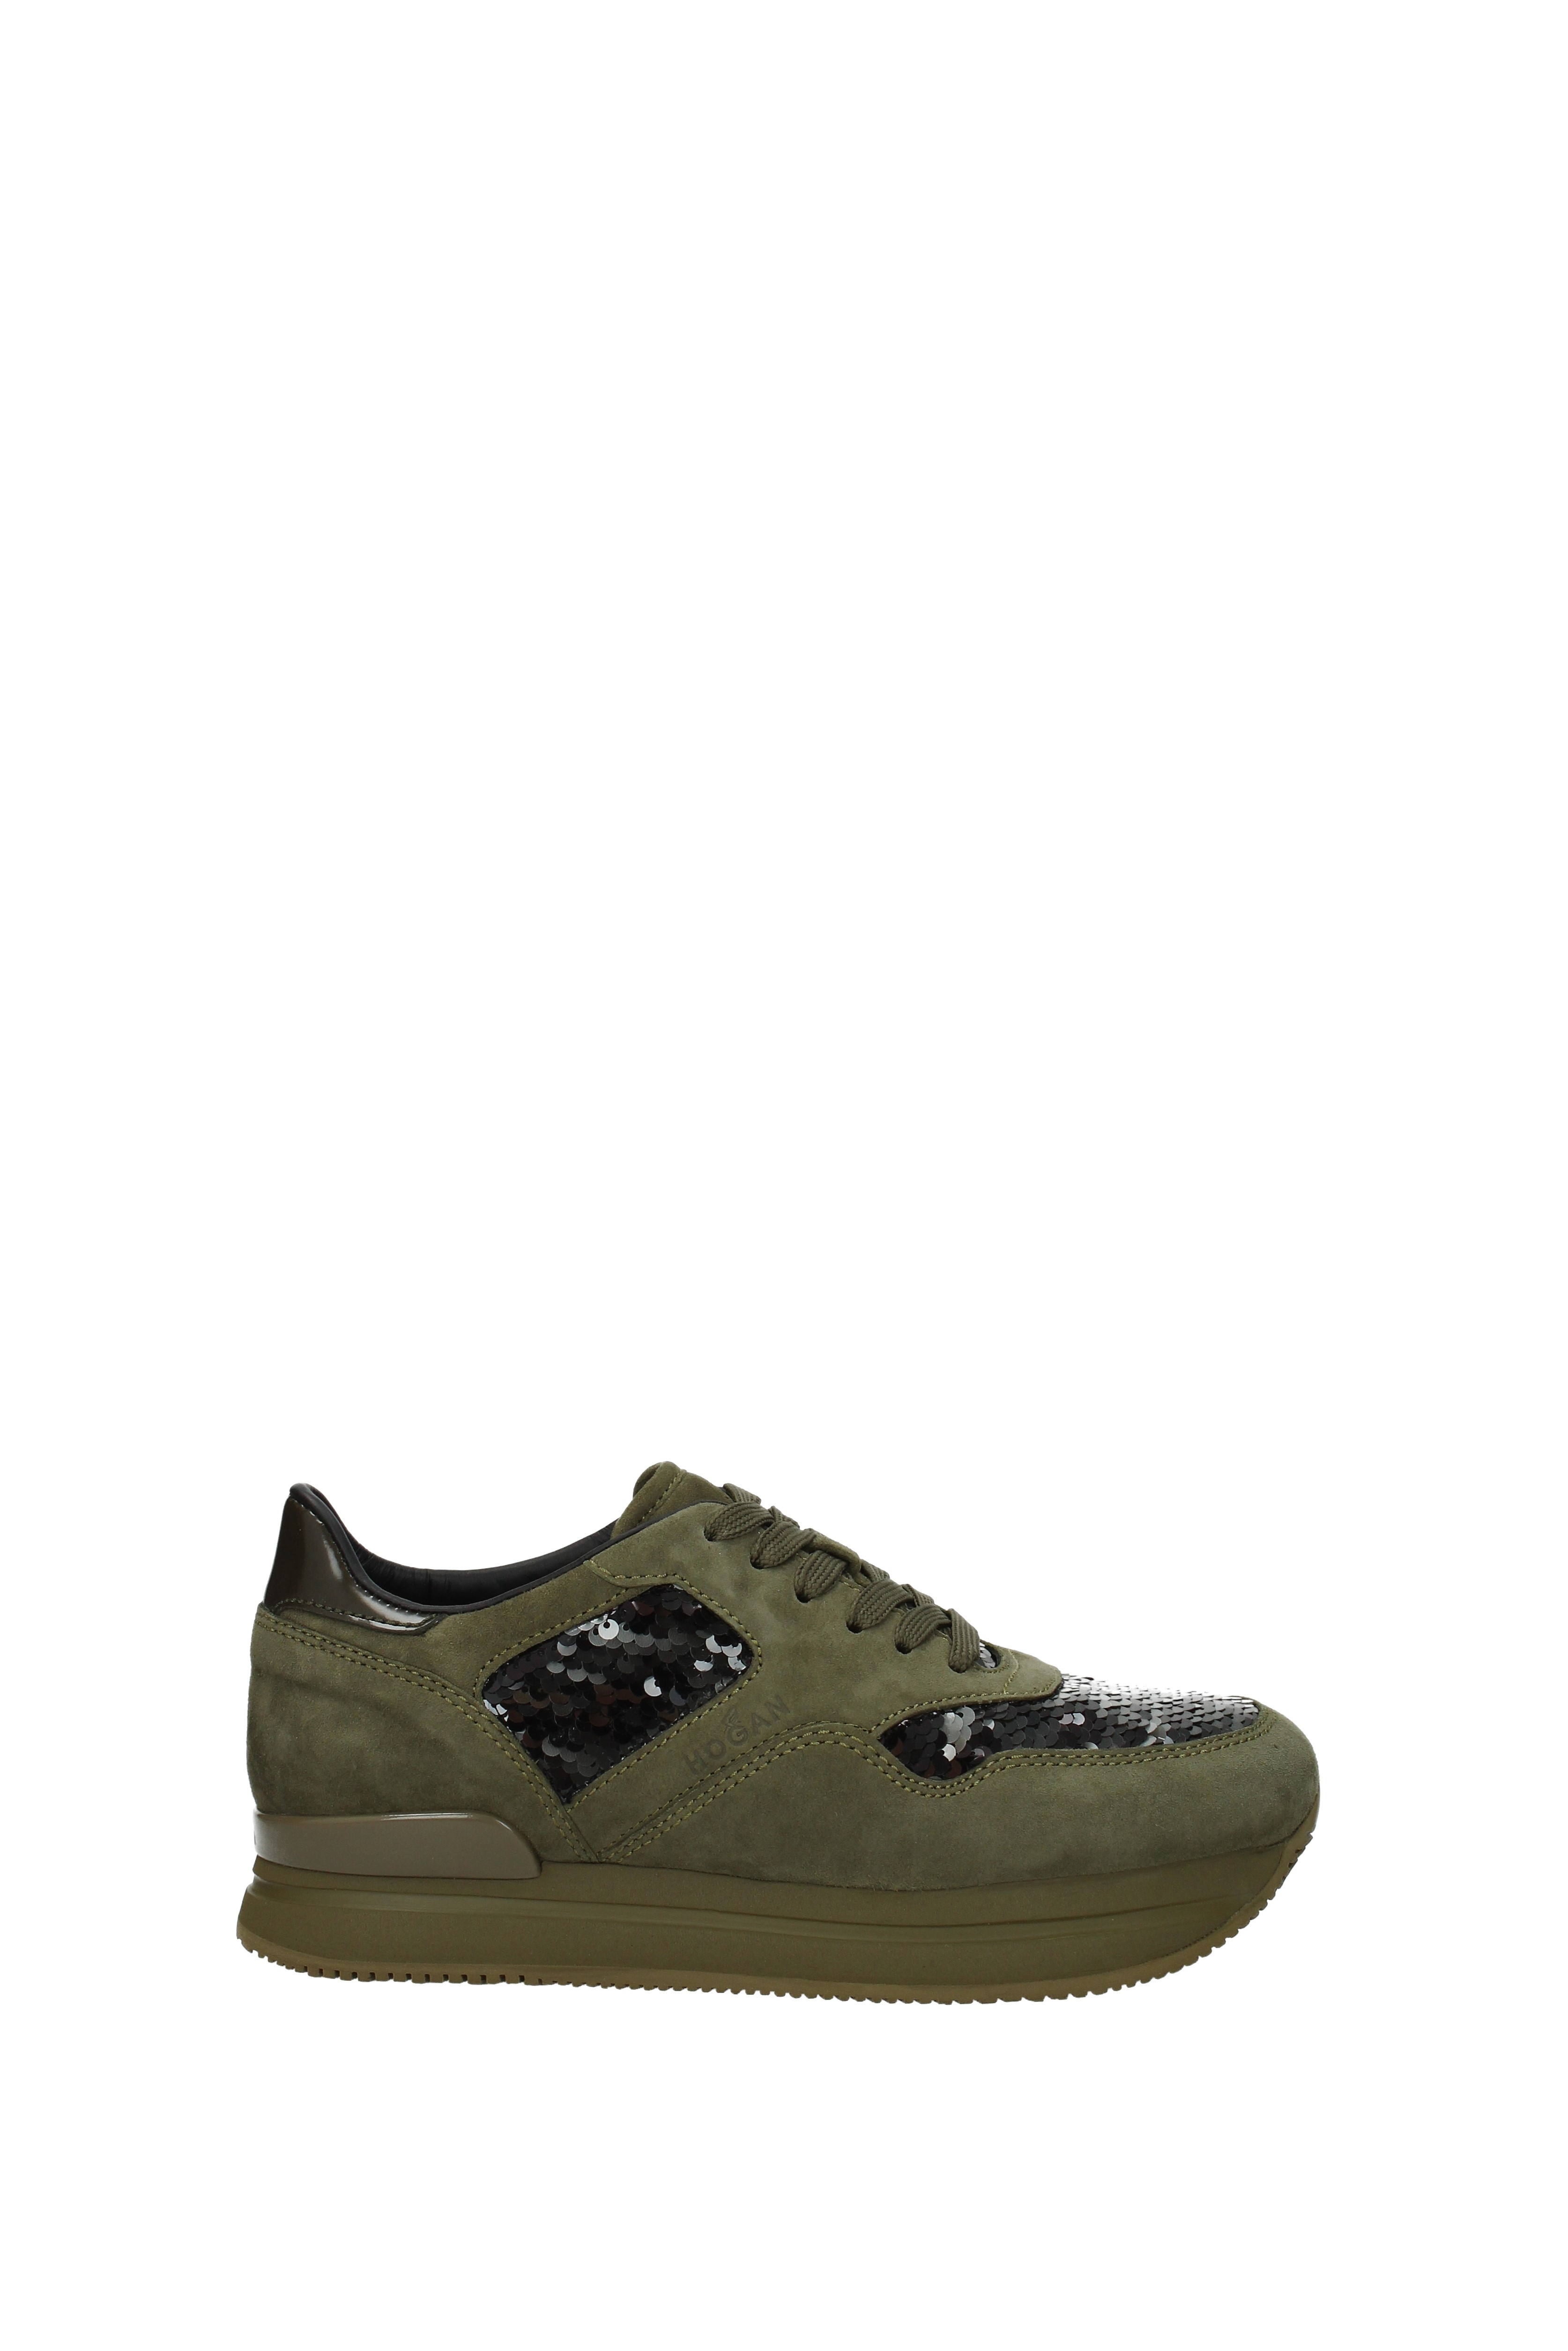 Alta qualit Sneakers Hogan Donna Camoscio HXW2220N622H6P vendita